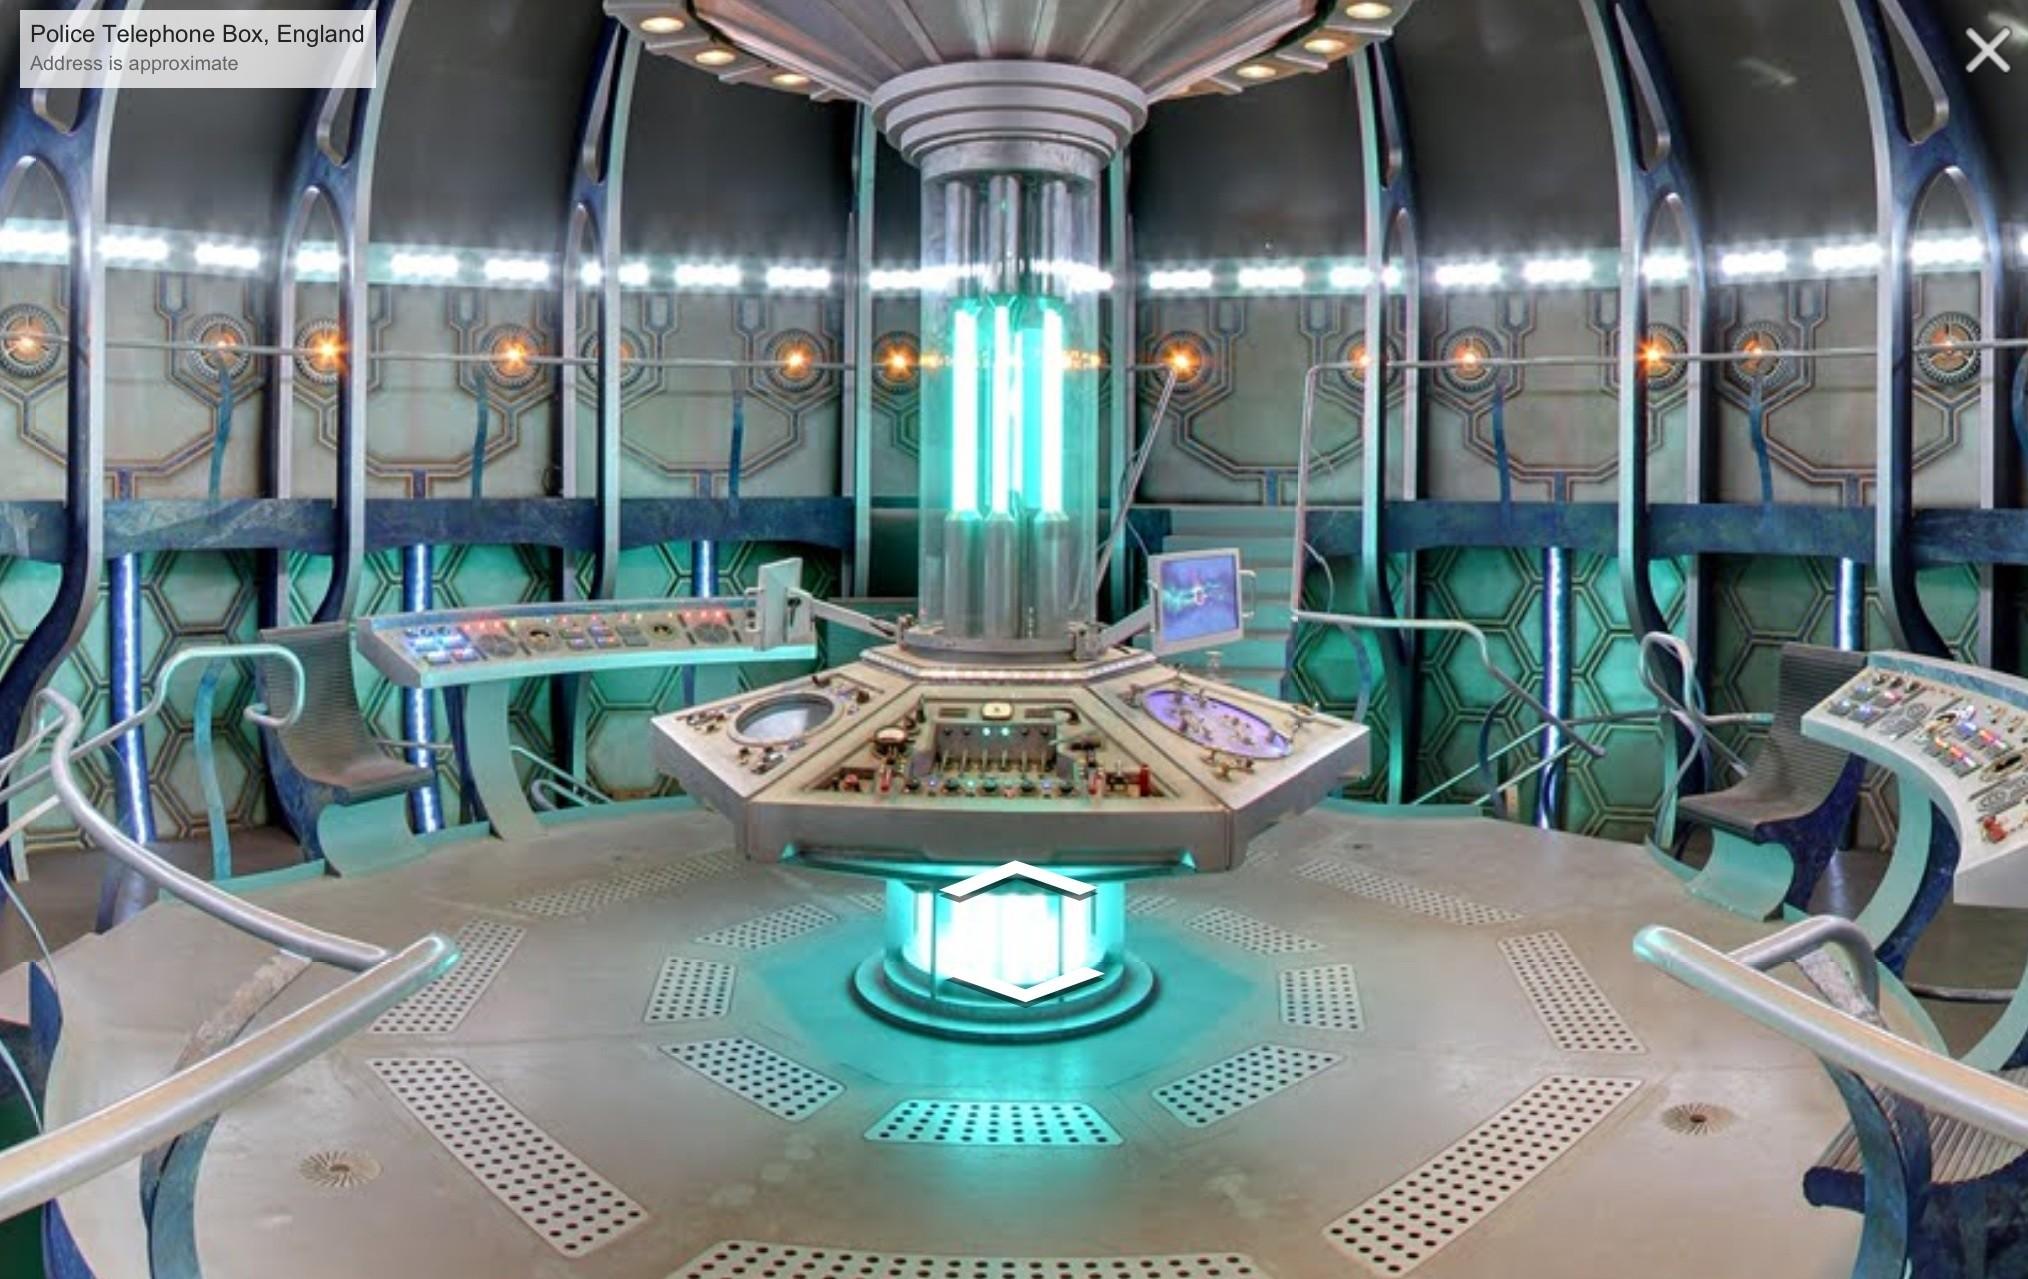 Tardis Interior Wallpaper Iphone Doctor who tardis interior on